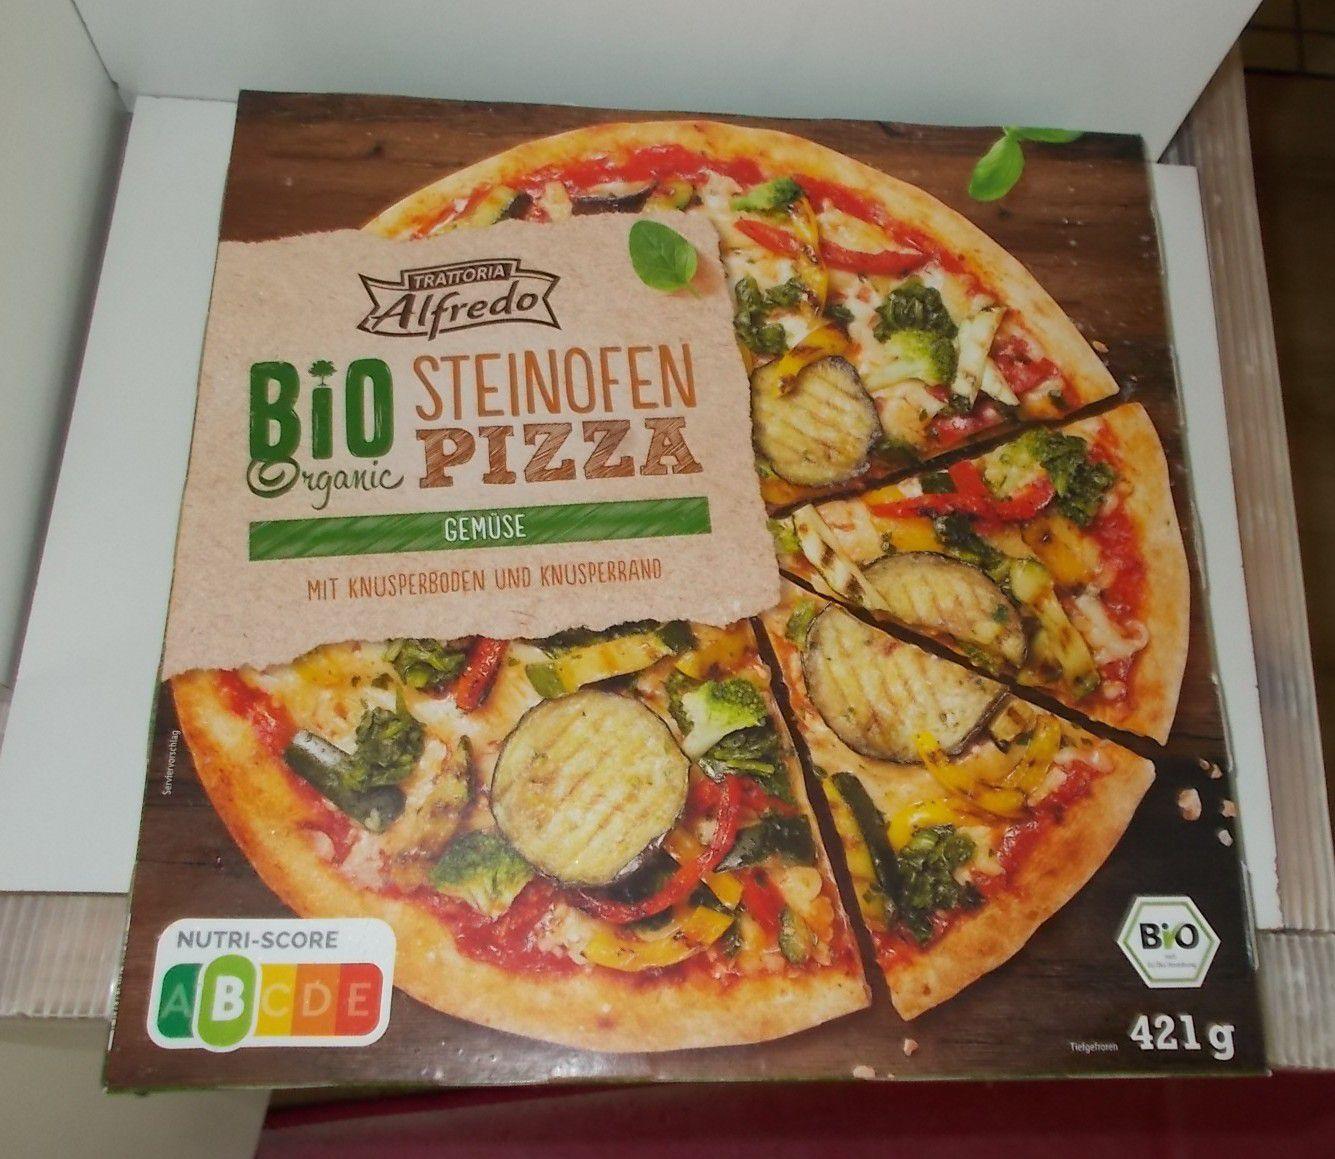 Lidl Alfredo Bio Steinofen Pizza Gemüse